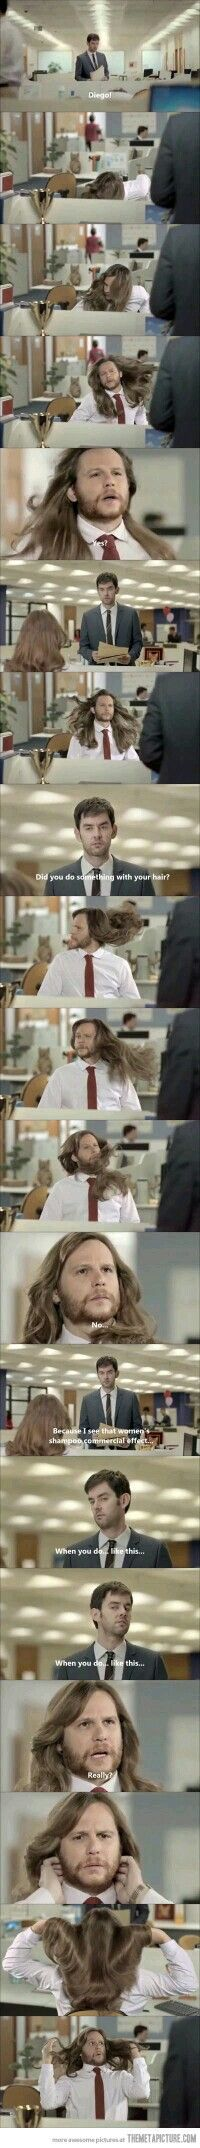 Haha that hair